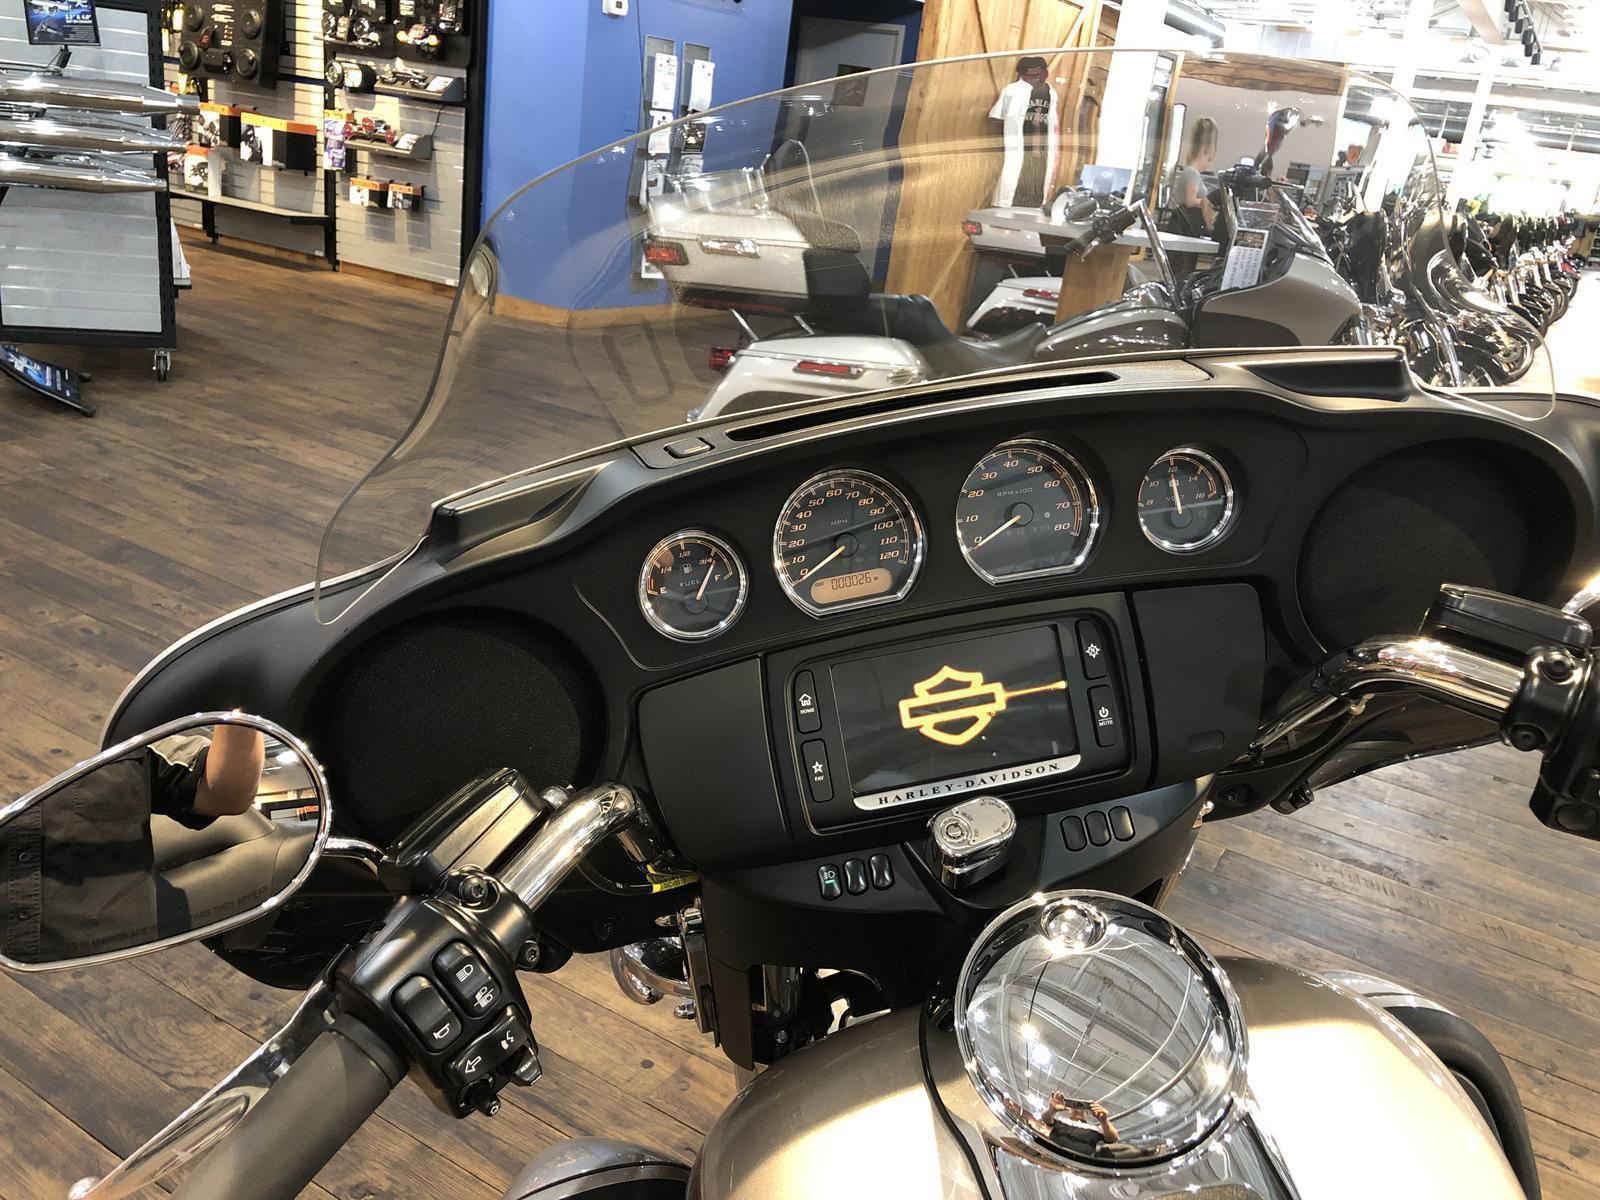 2018 Harley-Davidson® ELECTRA GLIDE ULTRA CLASSIC SILVER